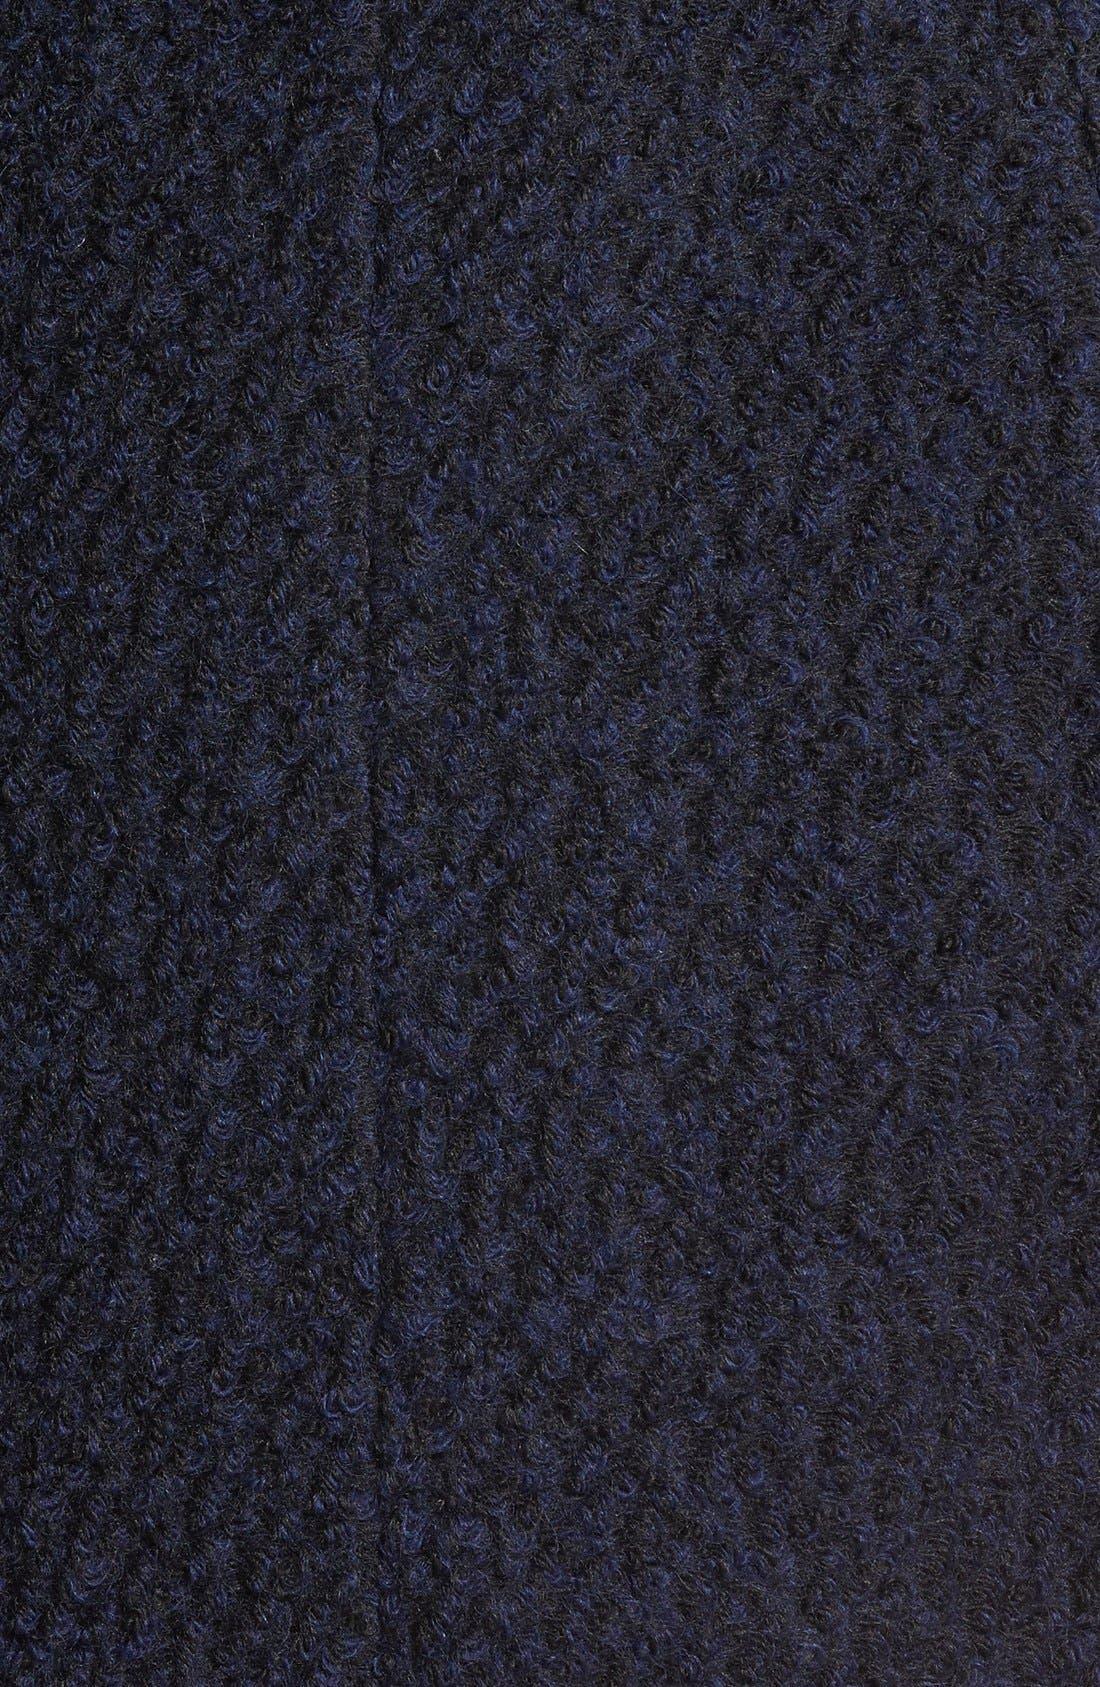 Belted Asymmetrical Bouclé Wool Blend Coat,                             Alternate thumbnail 5, color,                             004